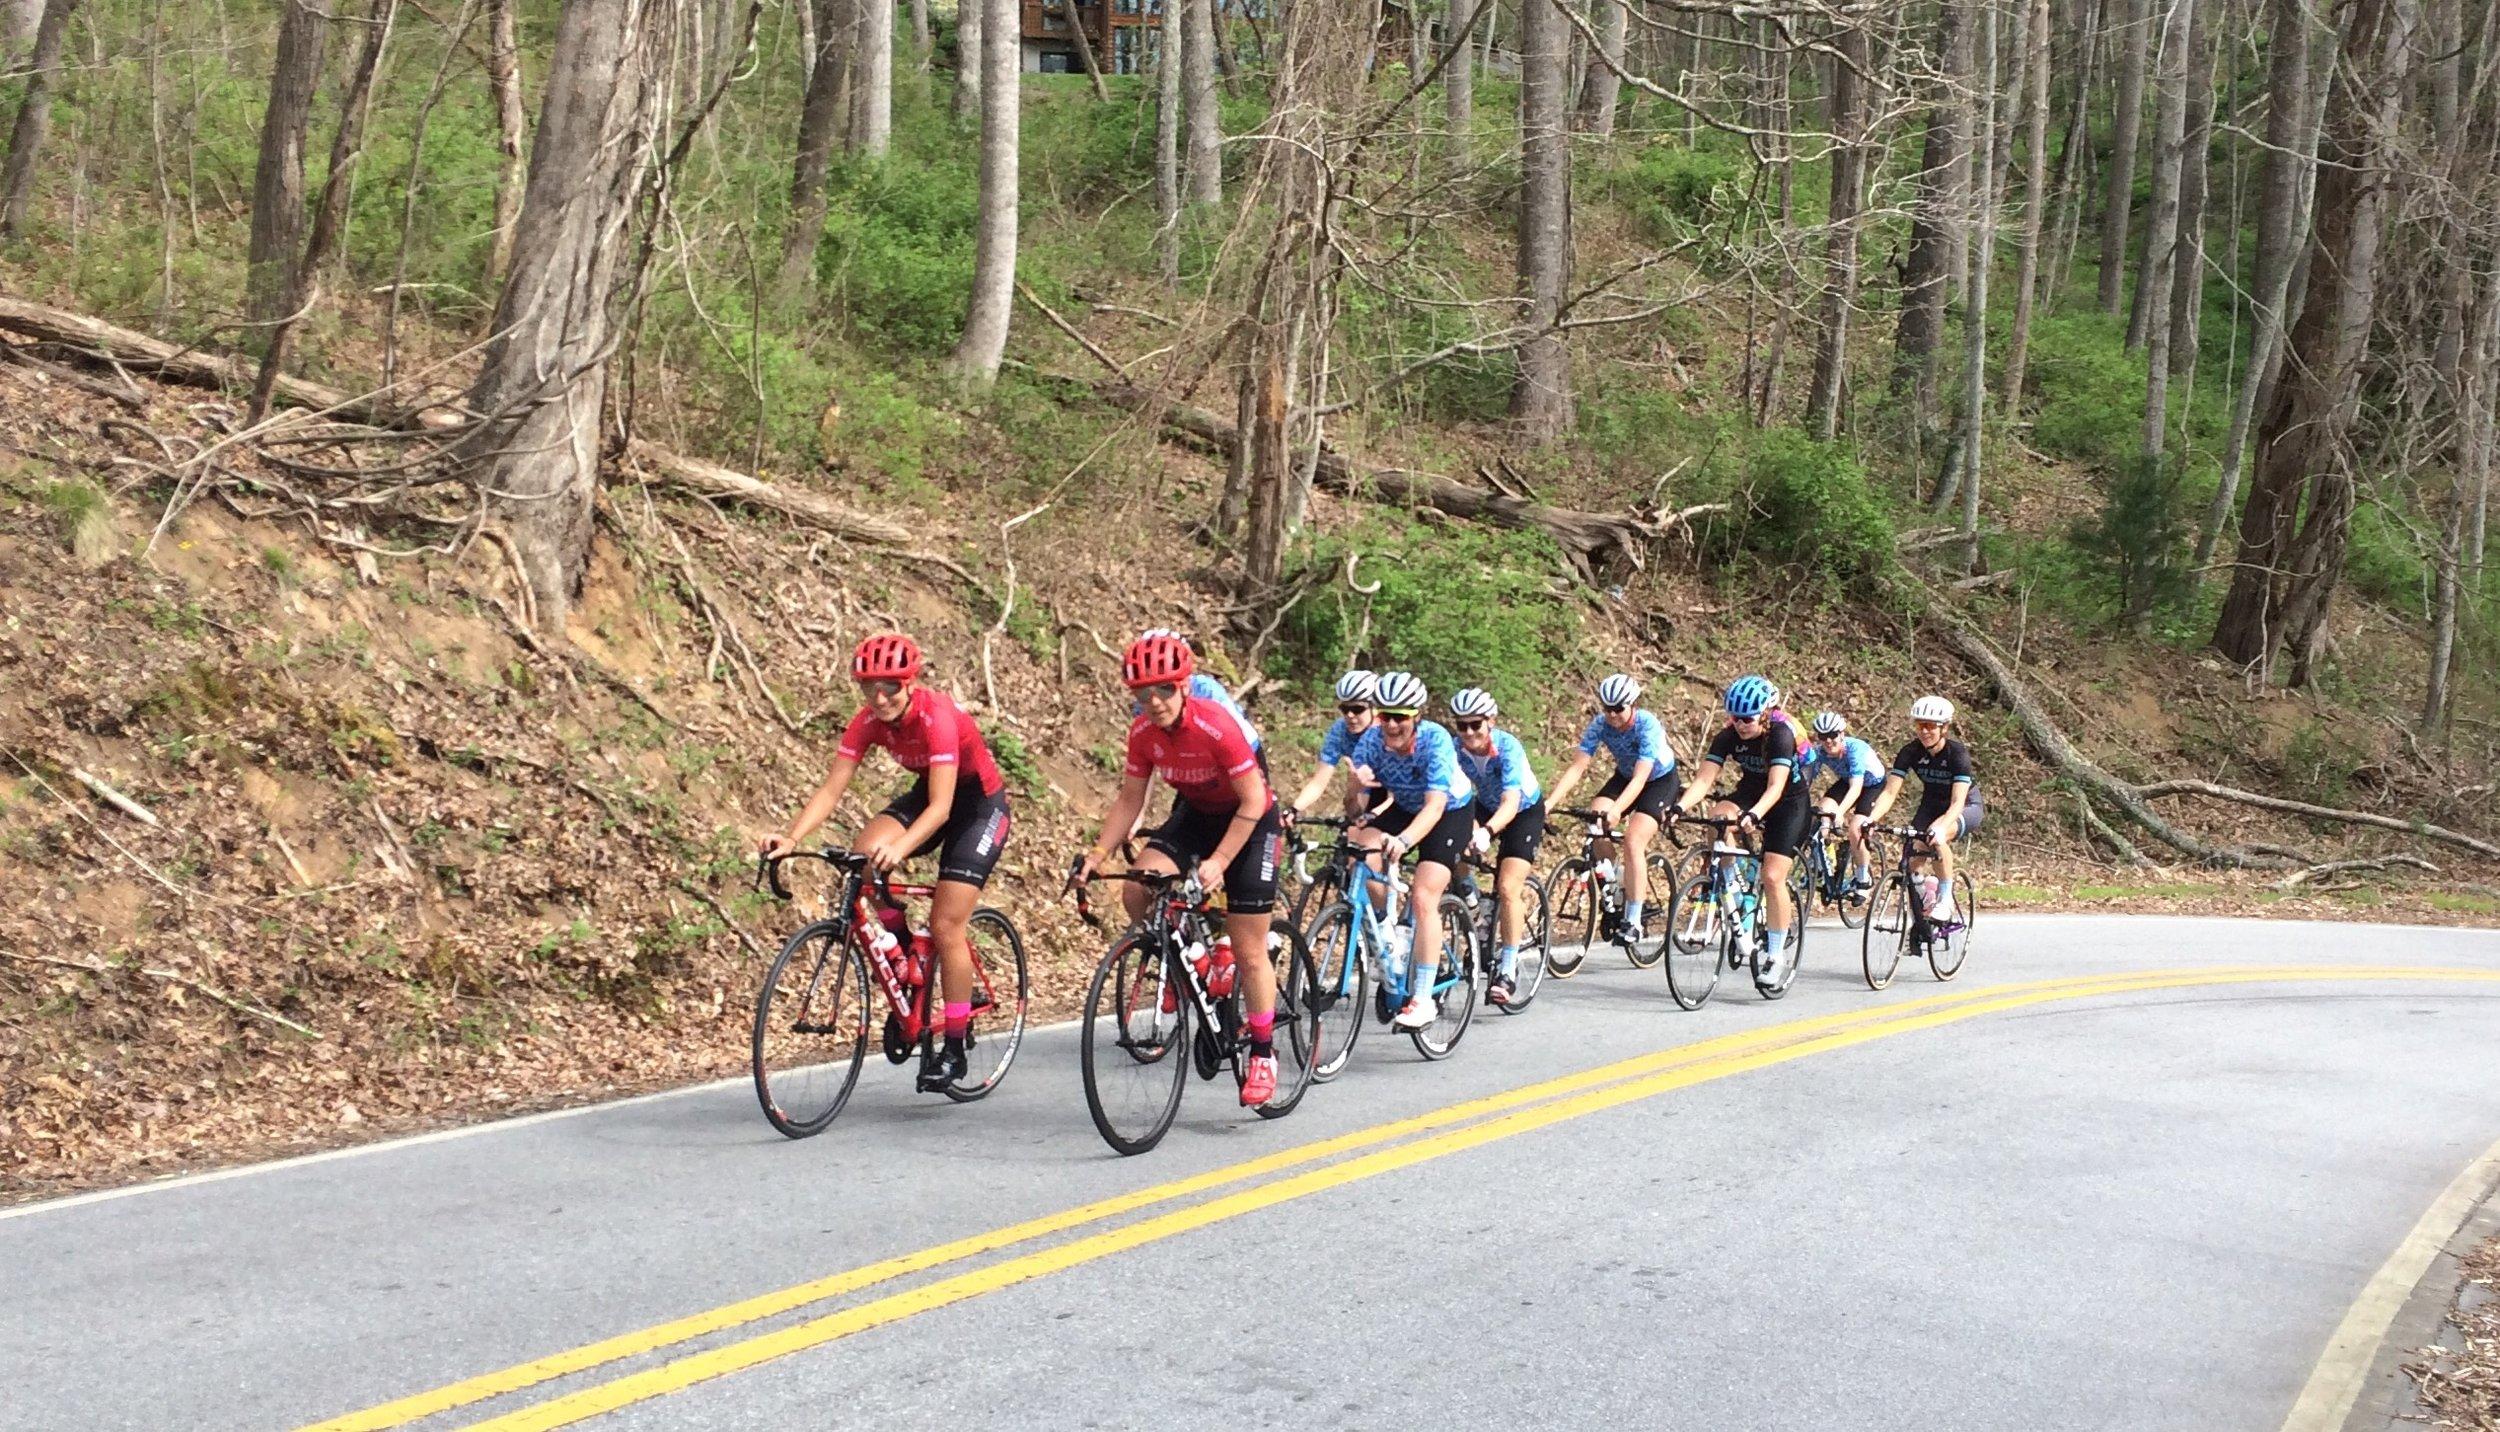 The Chicago Women's Elite Cycling 2017 Training Camp - Coach, Mentor, Ride Leader, Program Organizer: Daphne KaragianisParticipants: 10 women racersLocation: Asheville, NC